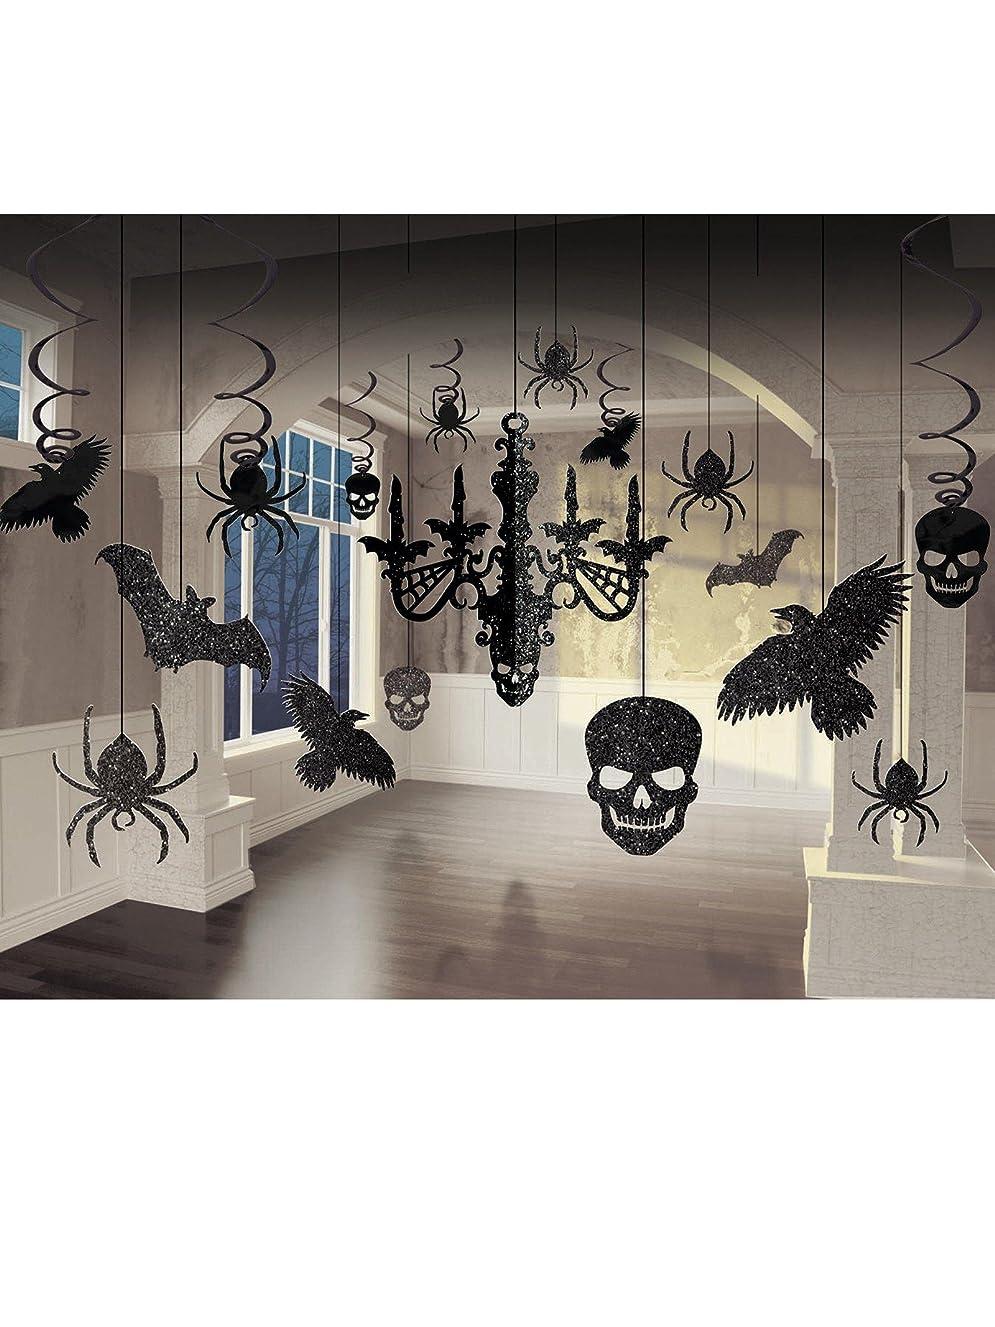 Shocktails Gothic Glitter Room Decorating Kit